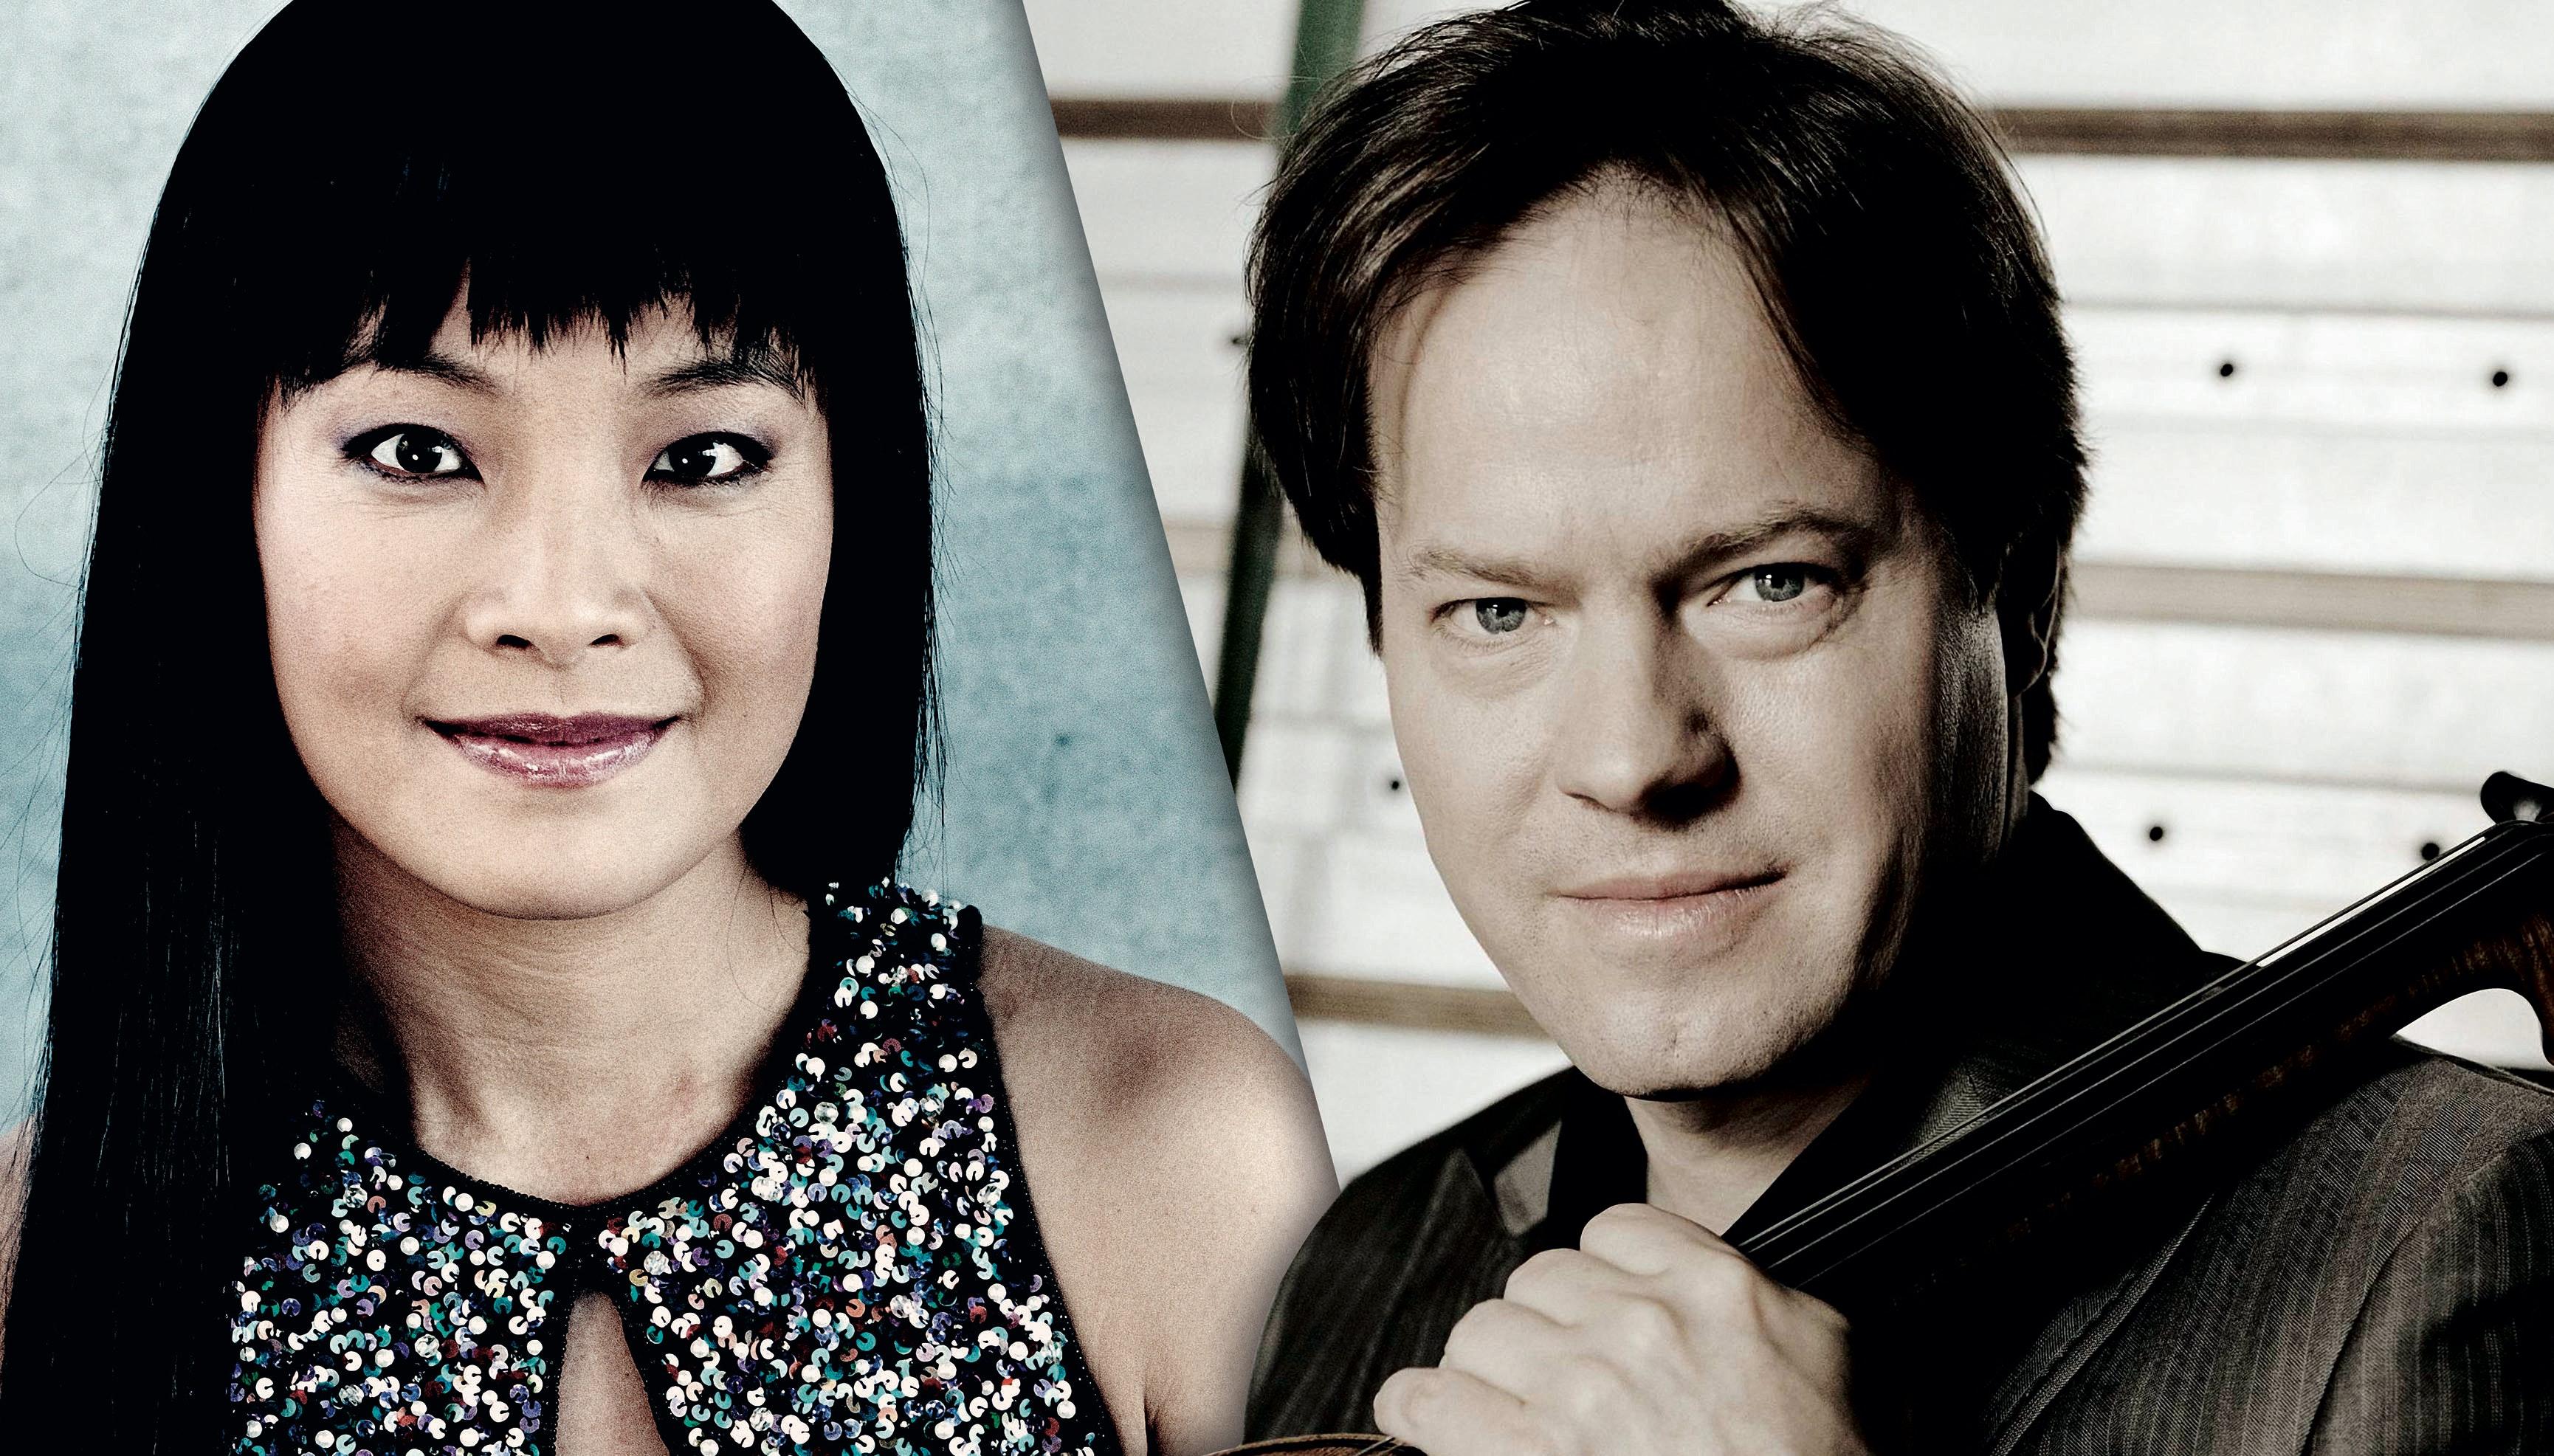 Dresden Music Festival: the Orpheus Chamber Orchestra performs Mendelssohn, Saint-Saëns, Rihm and Schumann